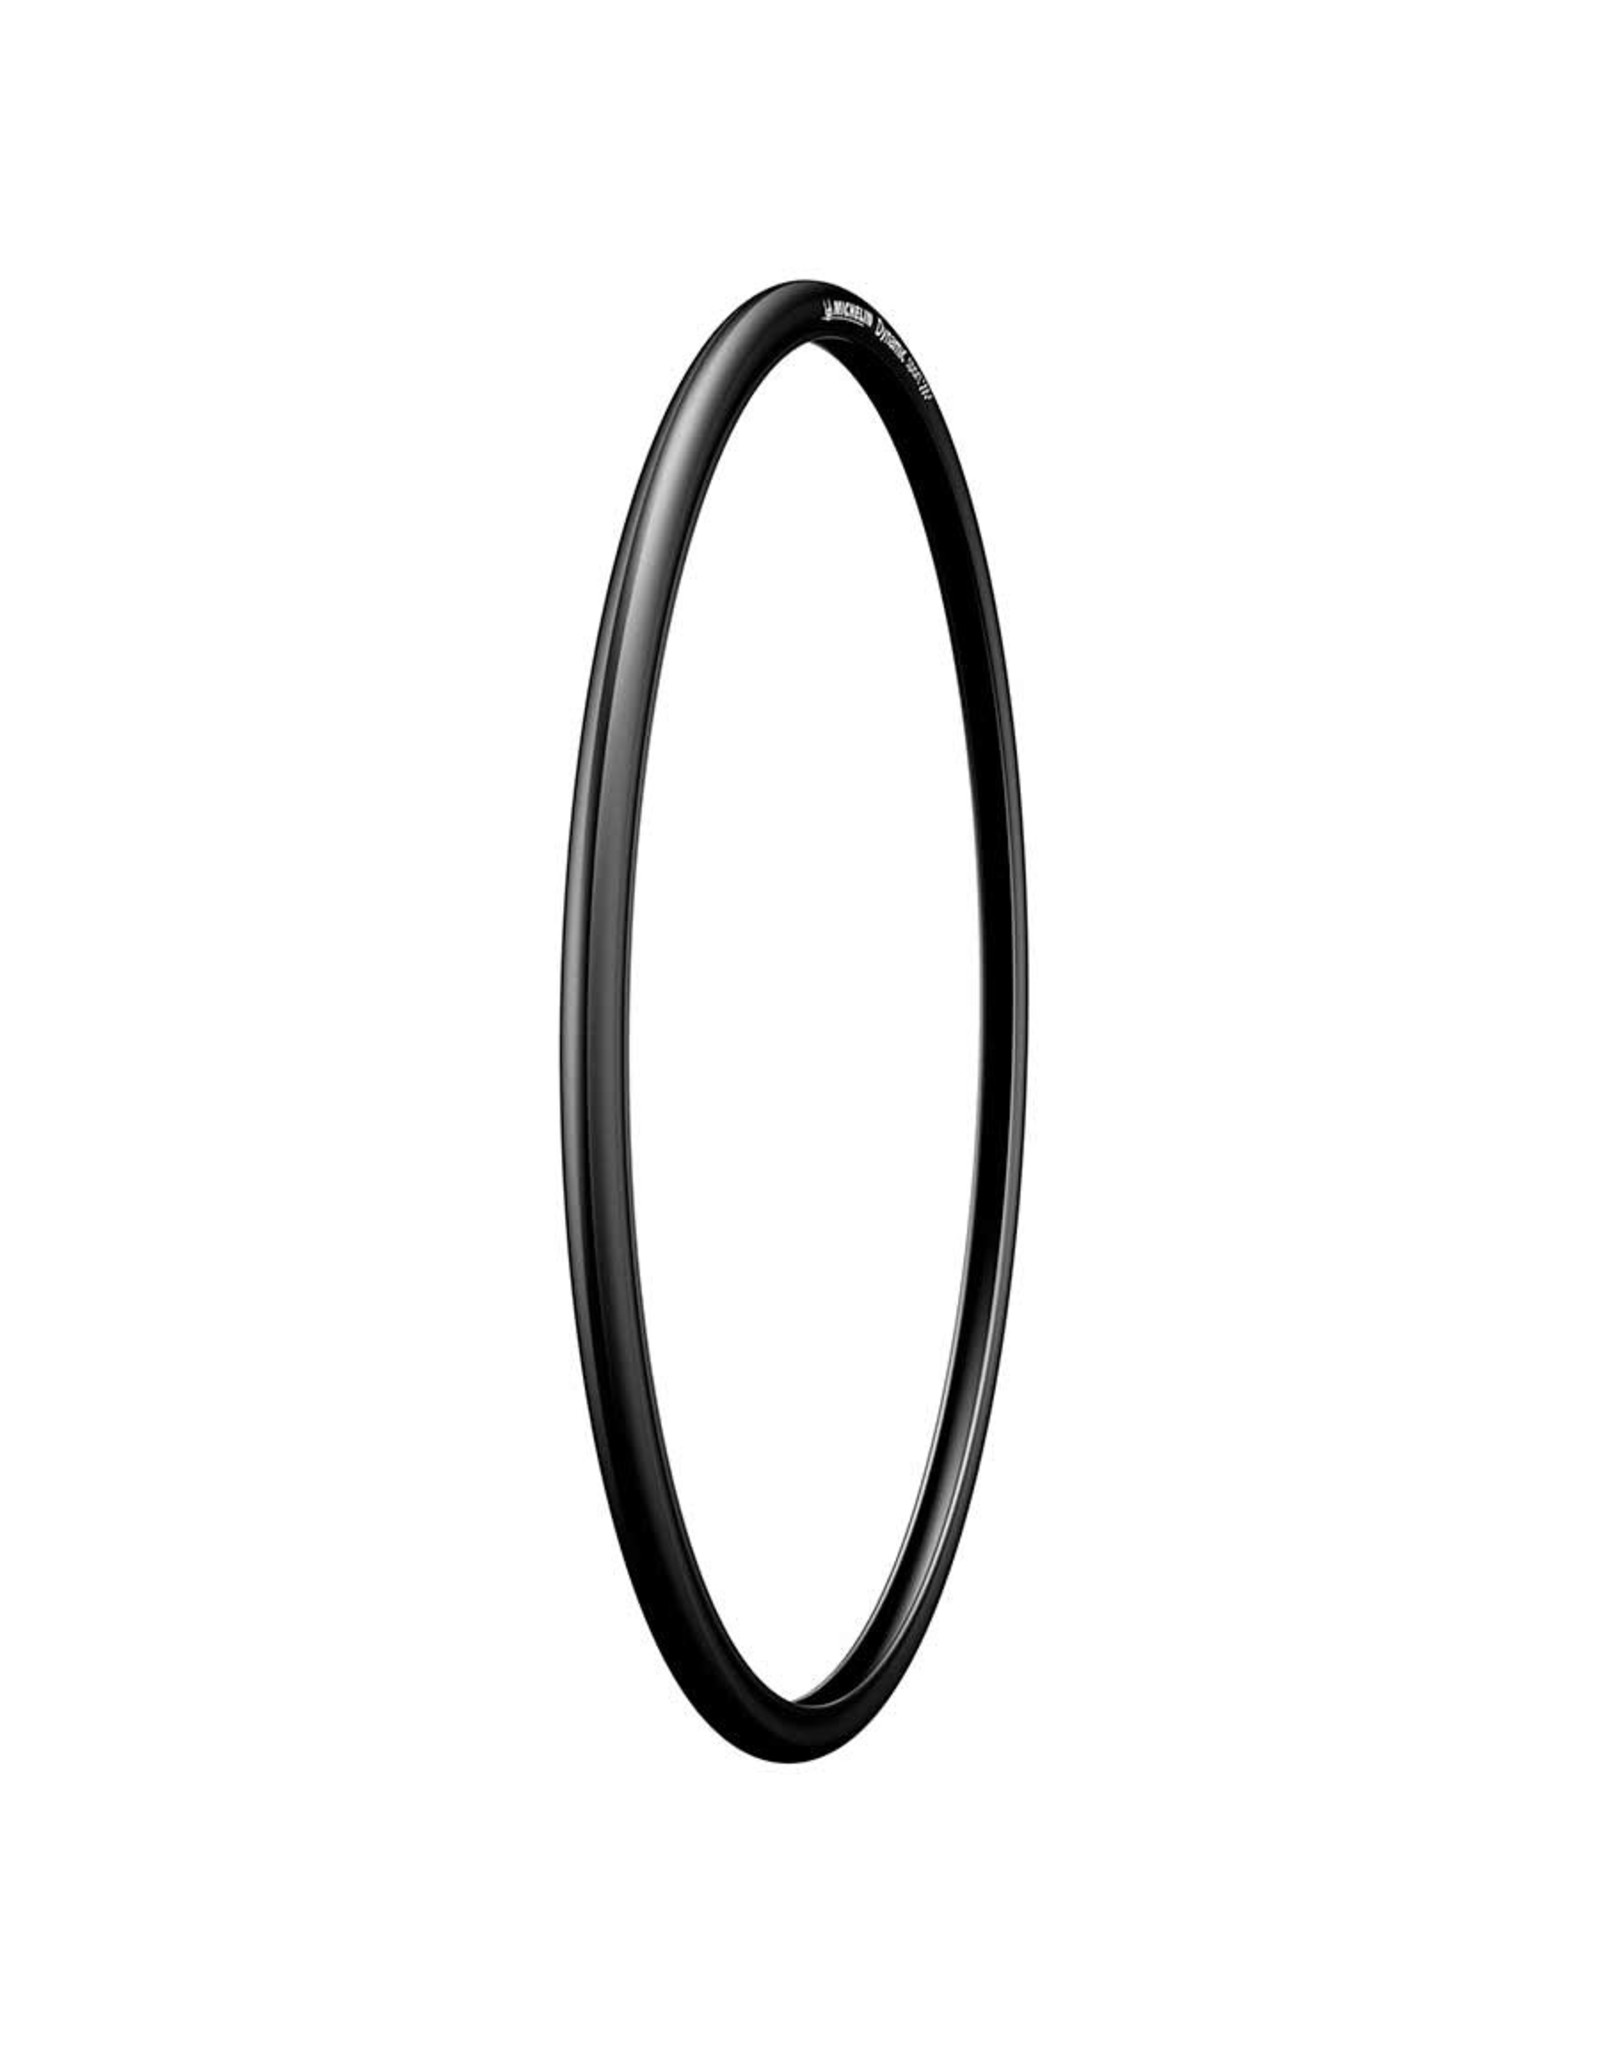 Michelin, Dynamic Sport, Tire, 700x25C, Folding, Clincher, Single, 30TPI, Black